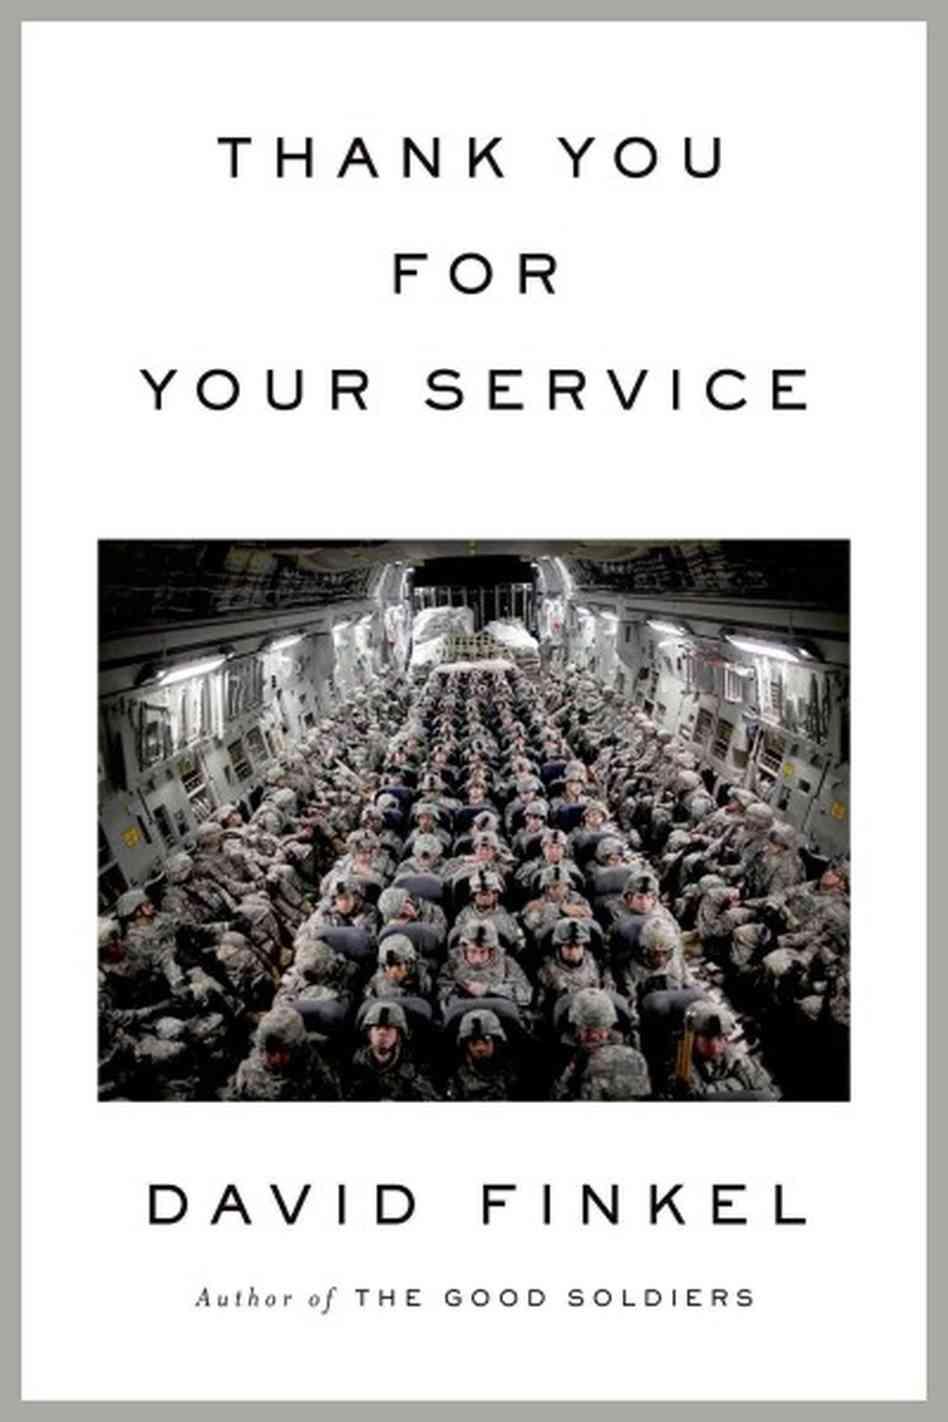 Image result for Thank you for your service – David Finkel